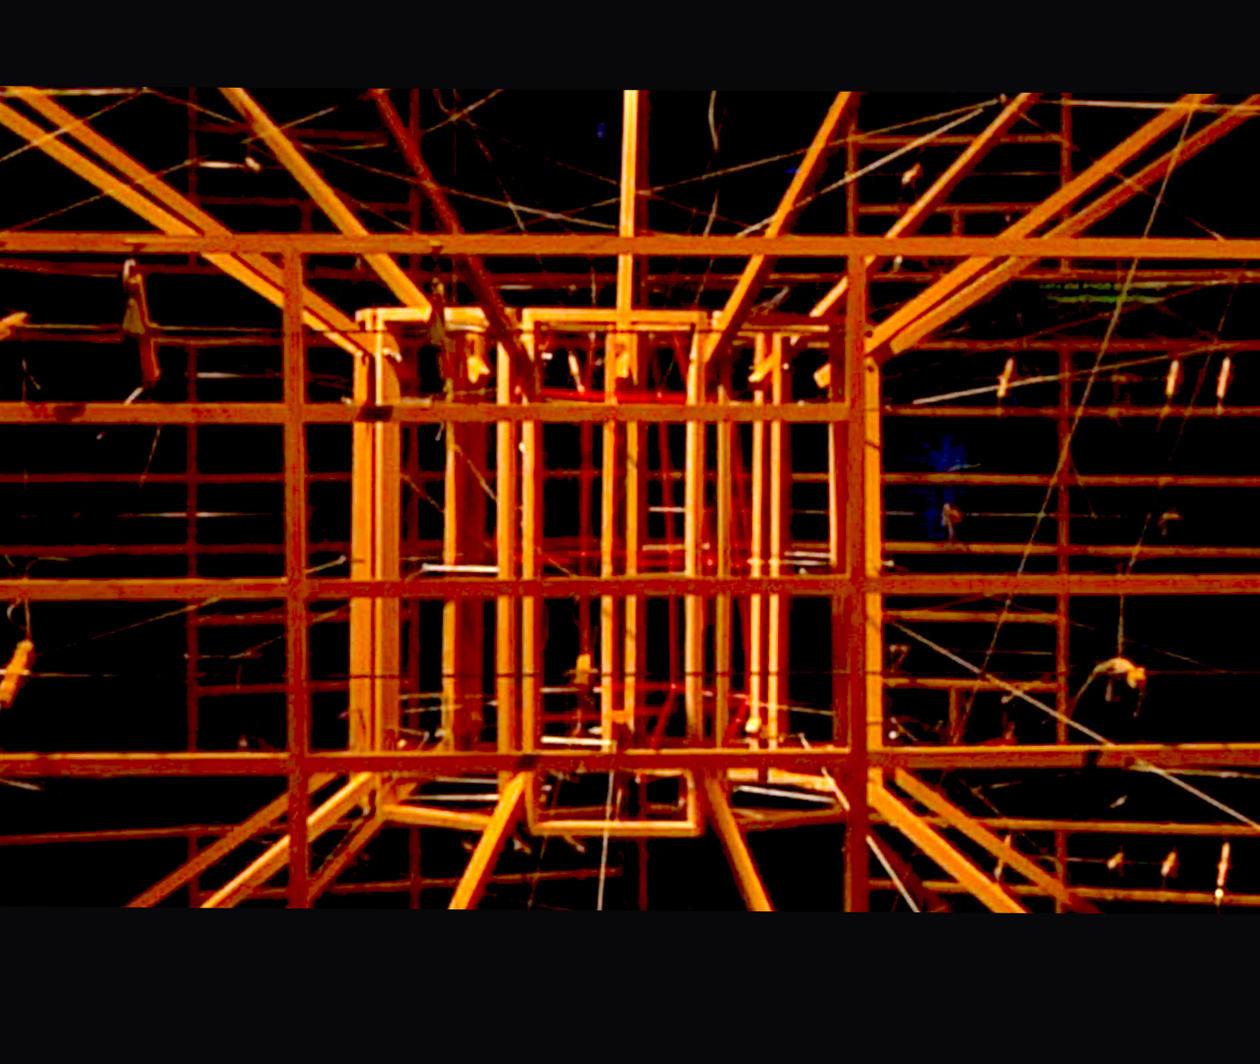 Understanding Ramon Llull: Philosophy, Arts and Science through the Ars Combinatoria